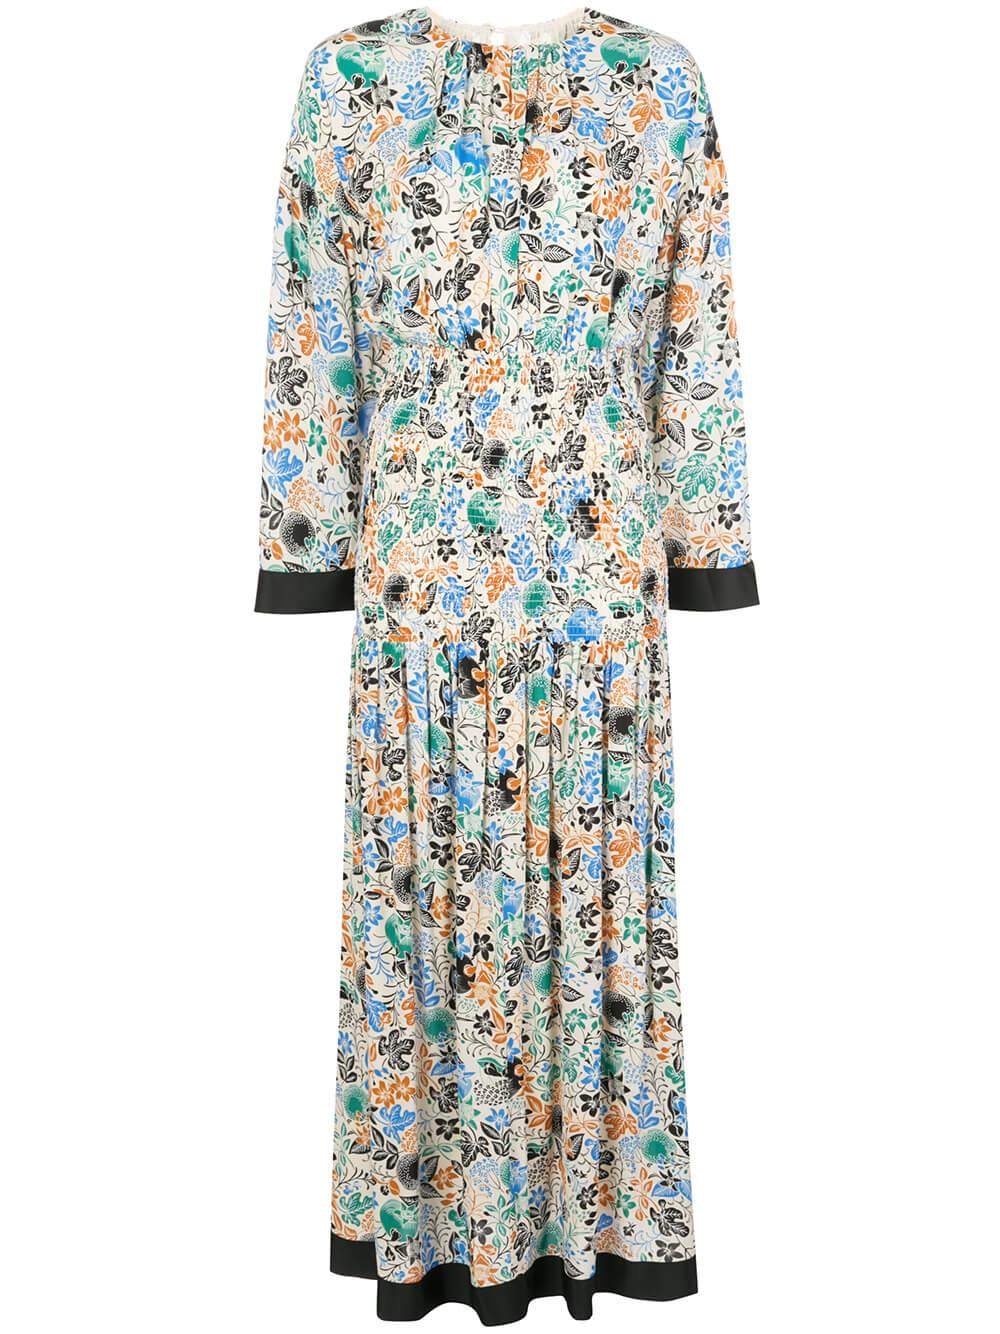 Reham Moroccan Garden Print Dress